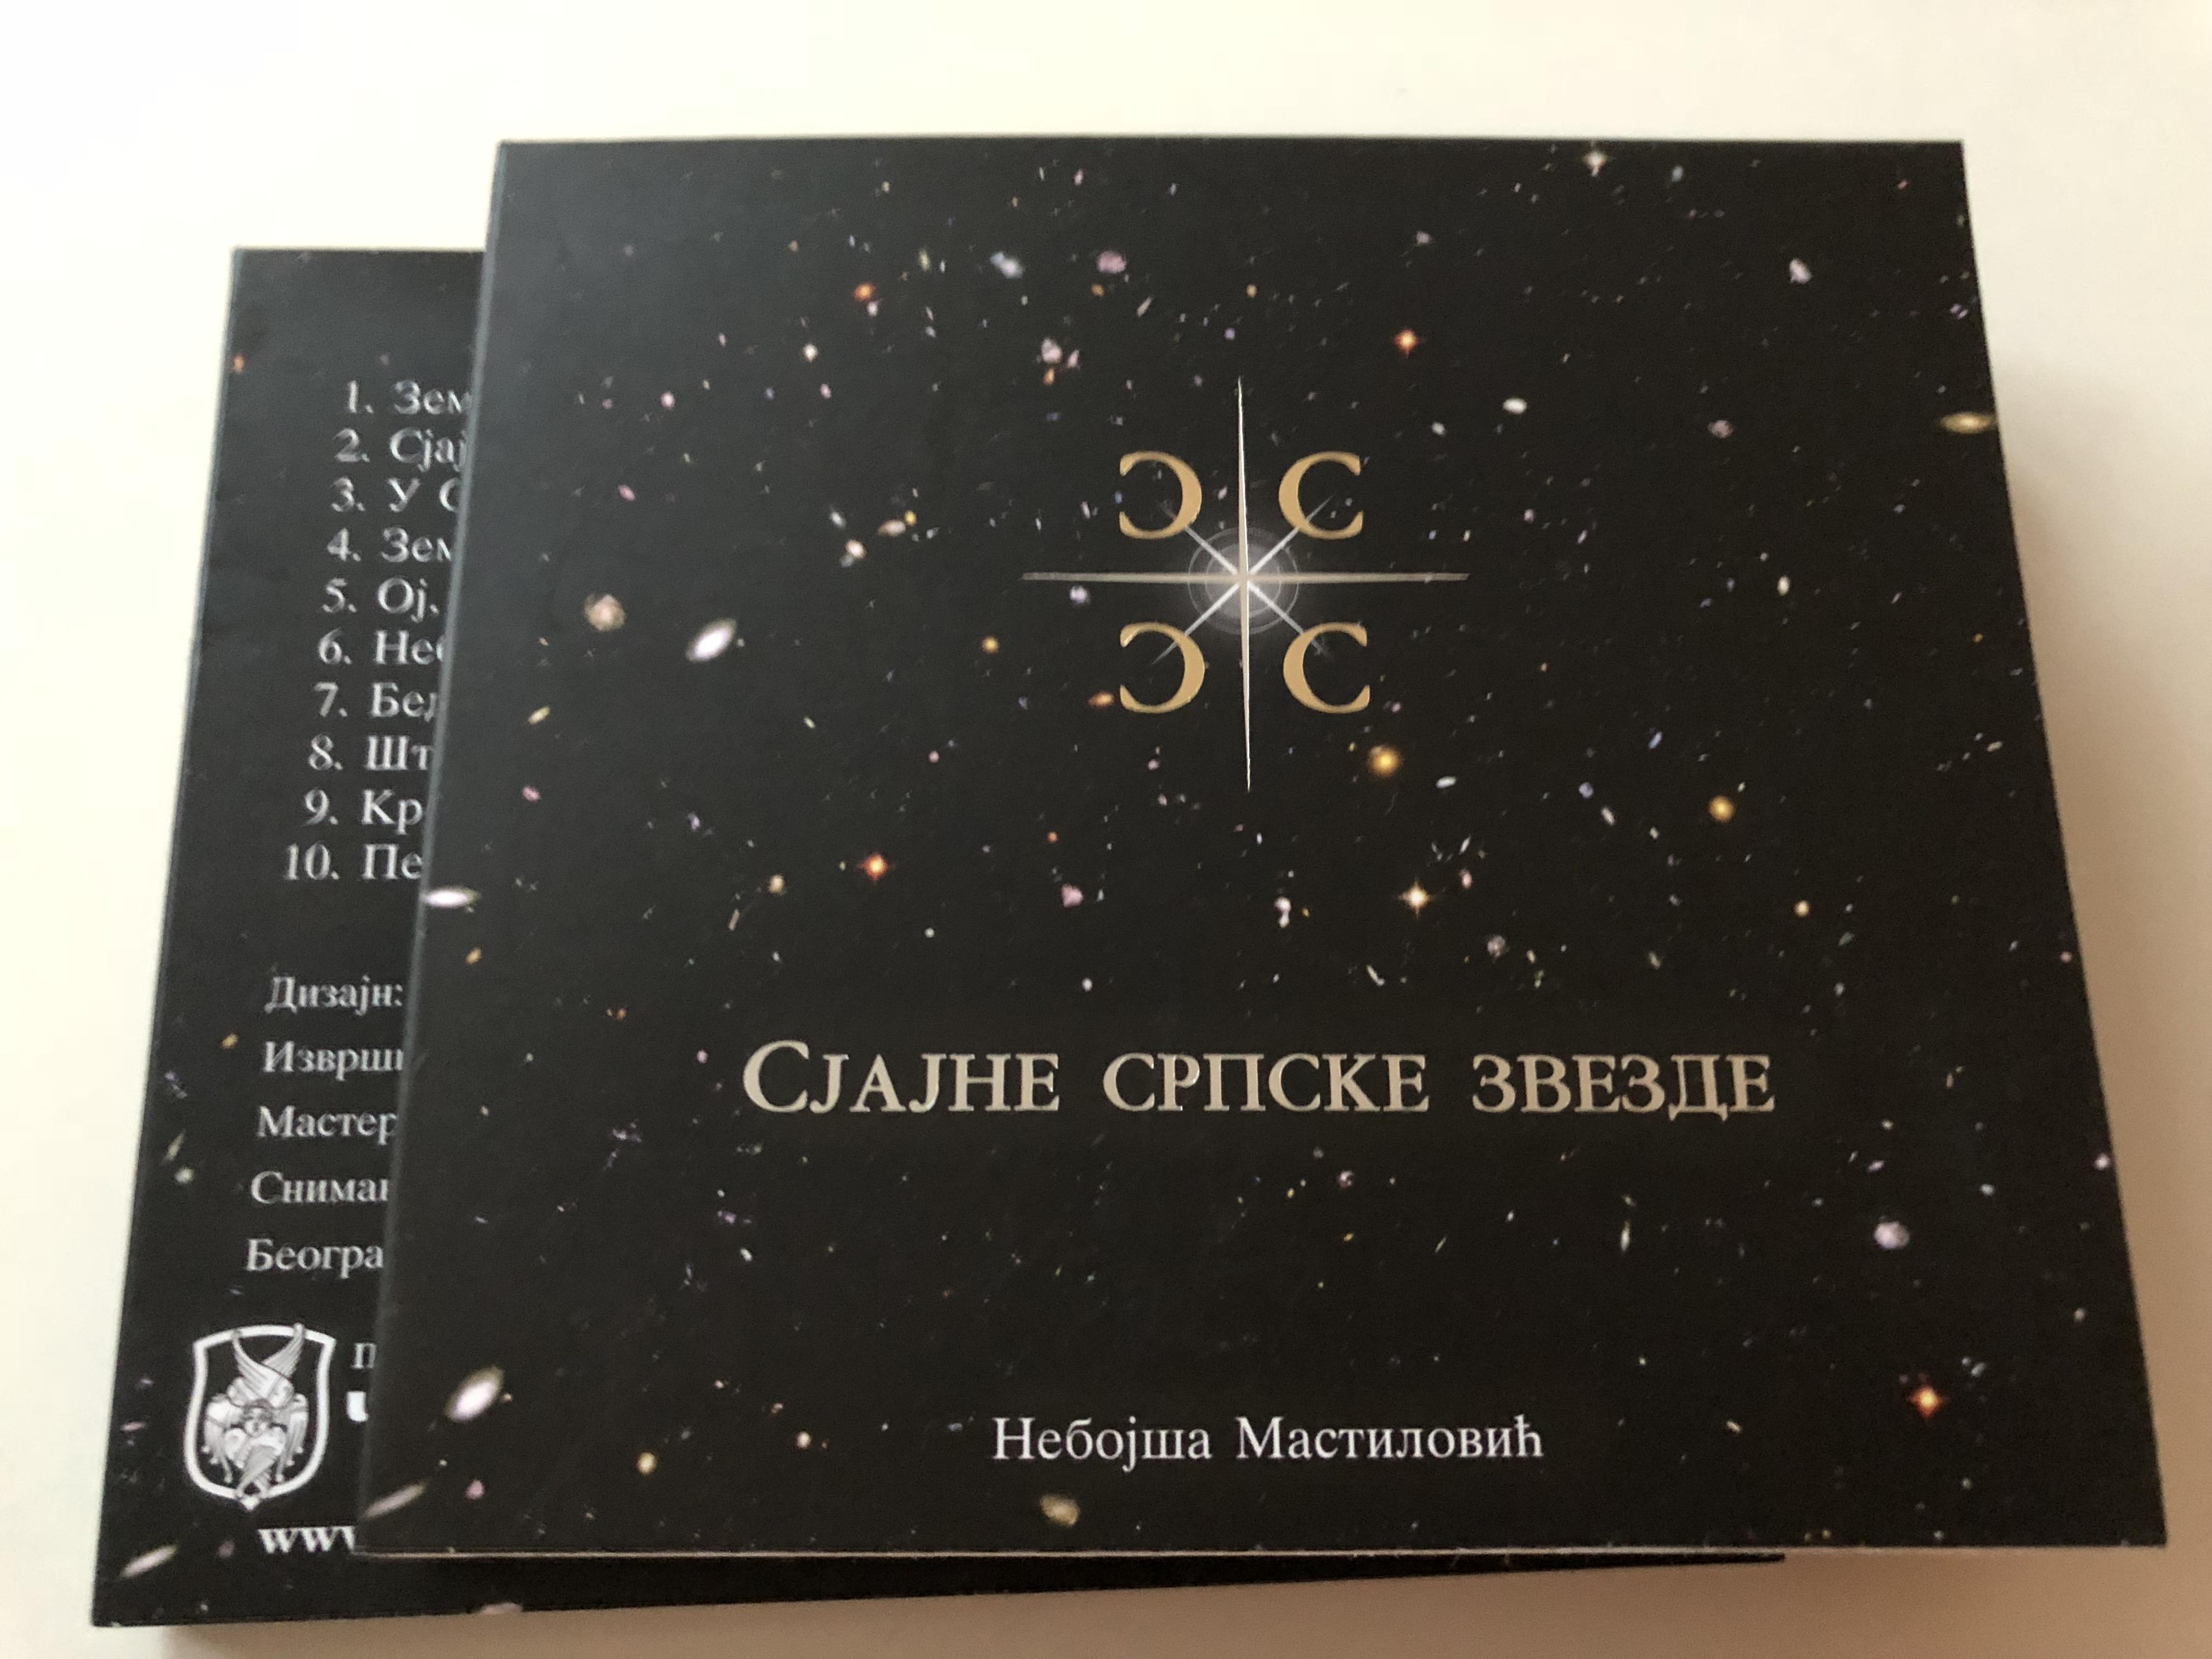 serbian-bright-serbian-stars-orthodox-music-cd-1-.jpg